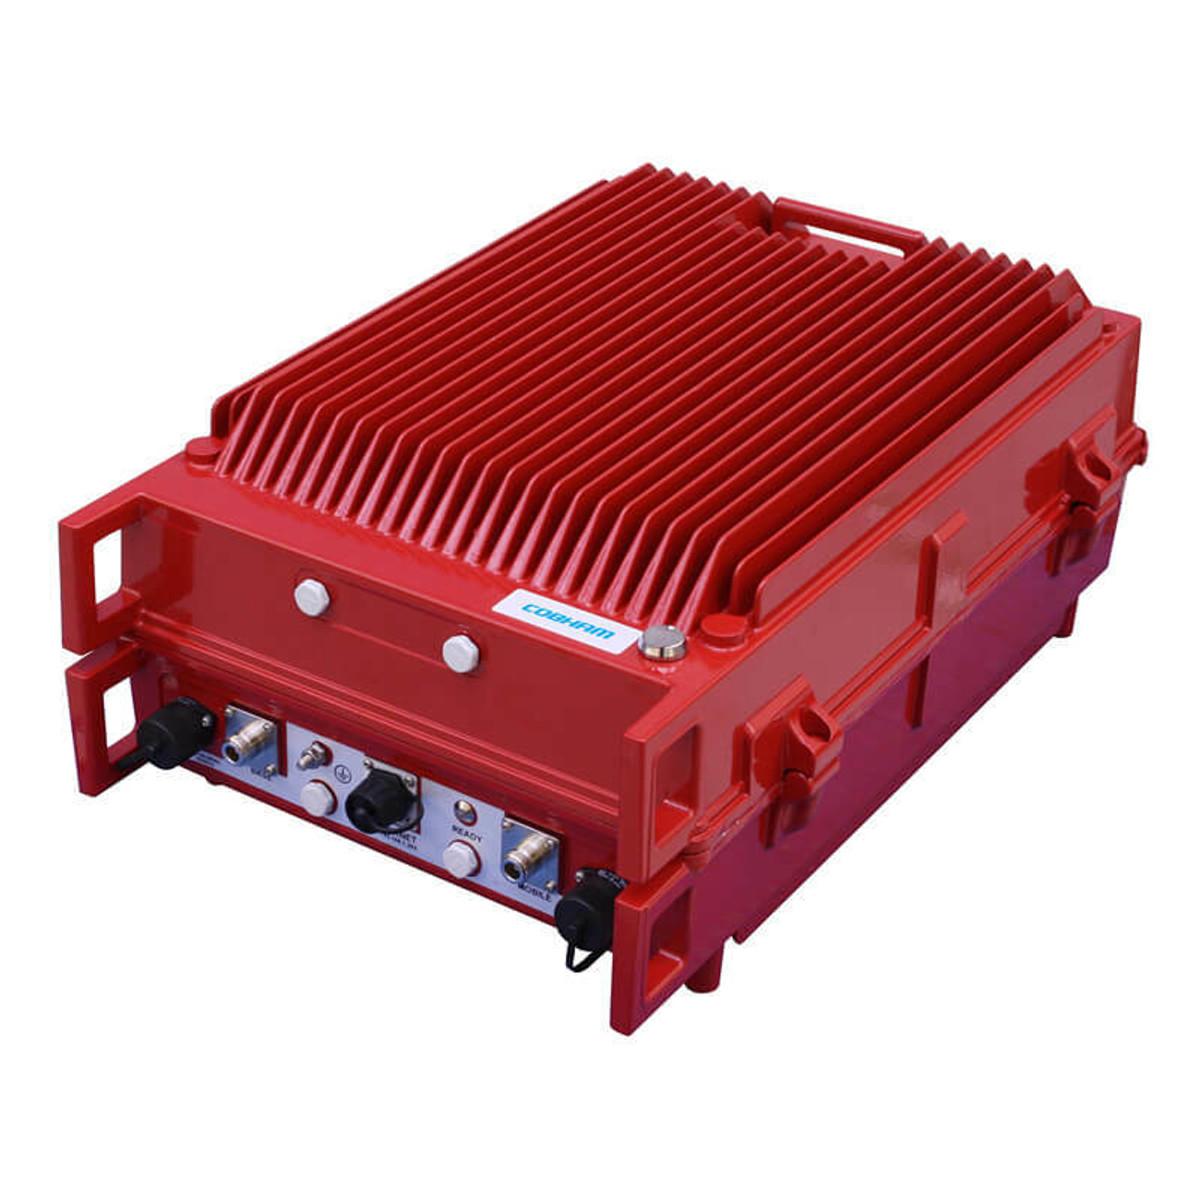 Cobham Cobham 700/800 MHz Digital Multi-Channel Class A Public Safety Signal Booster